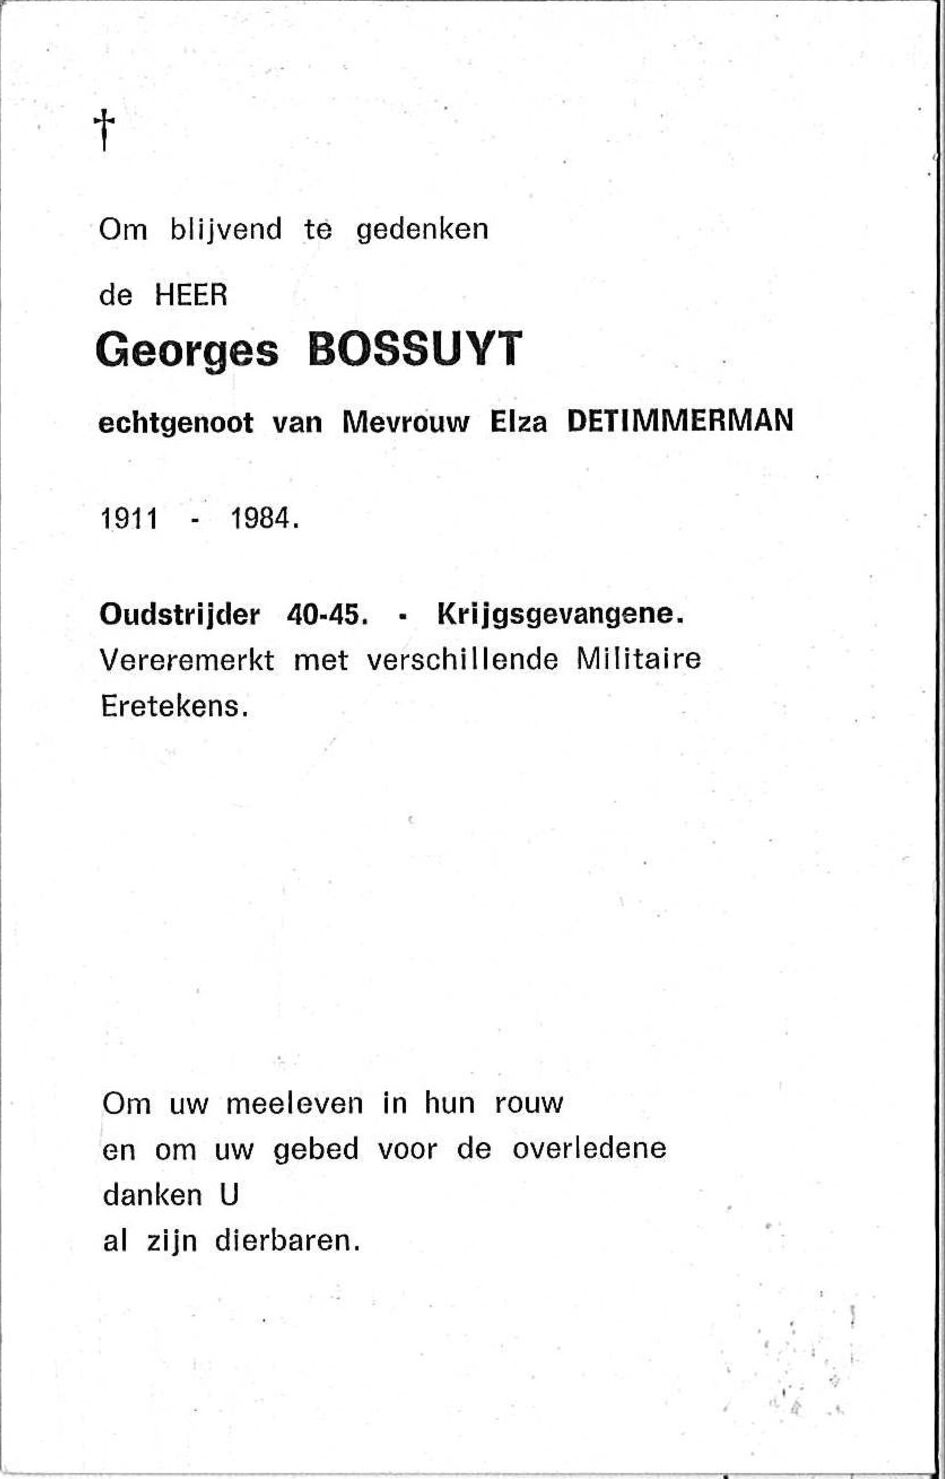 Bossuyt Georges